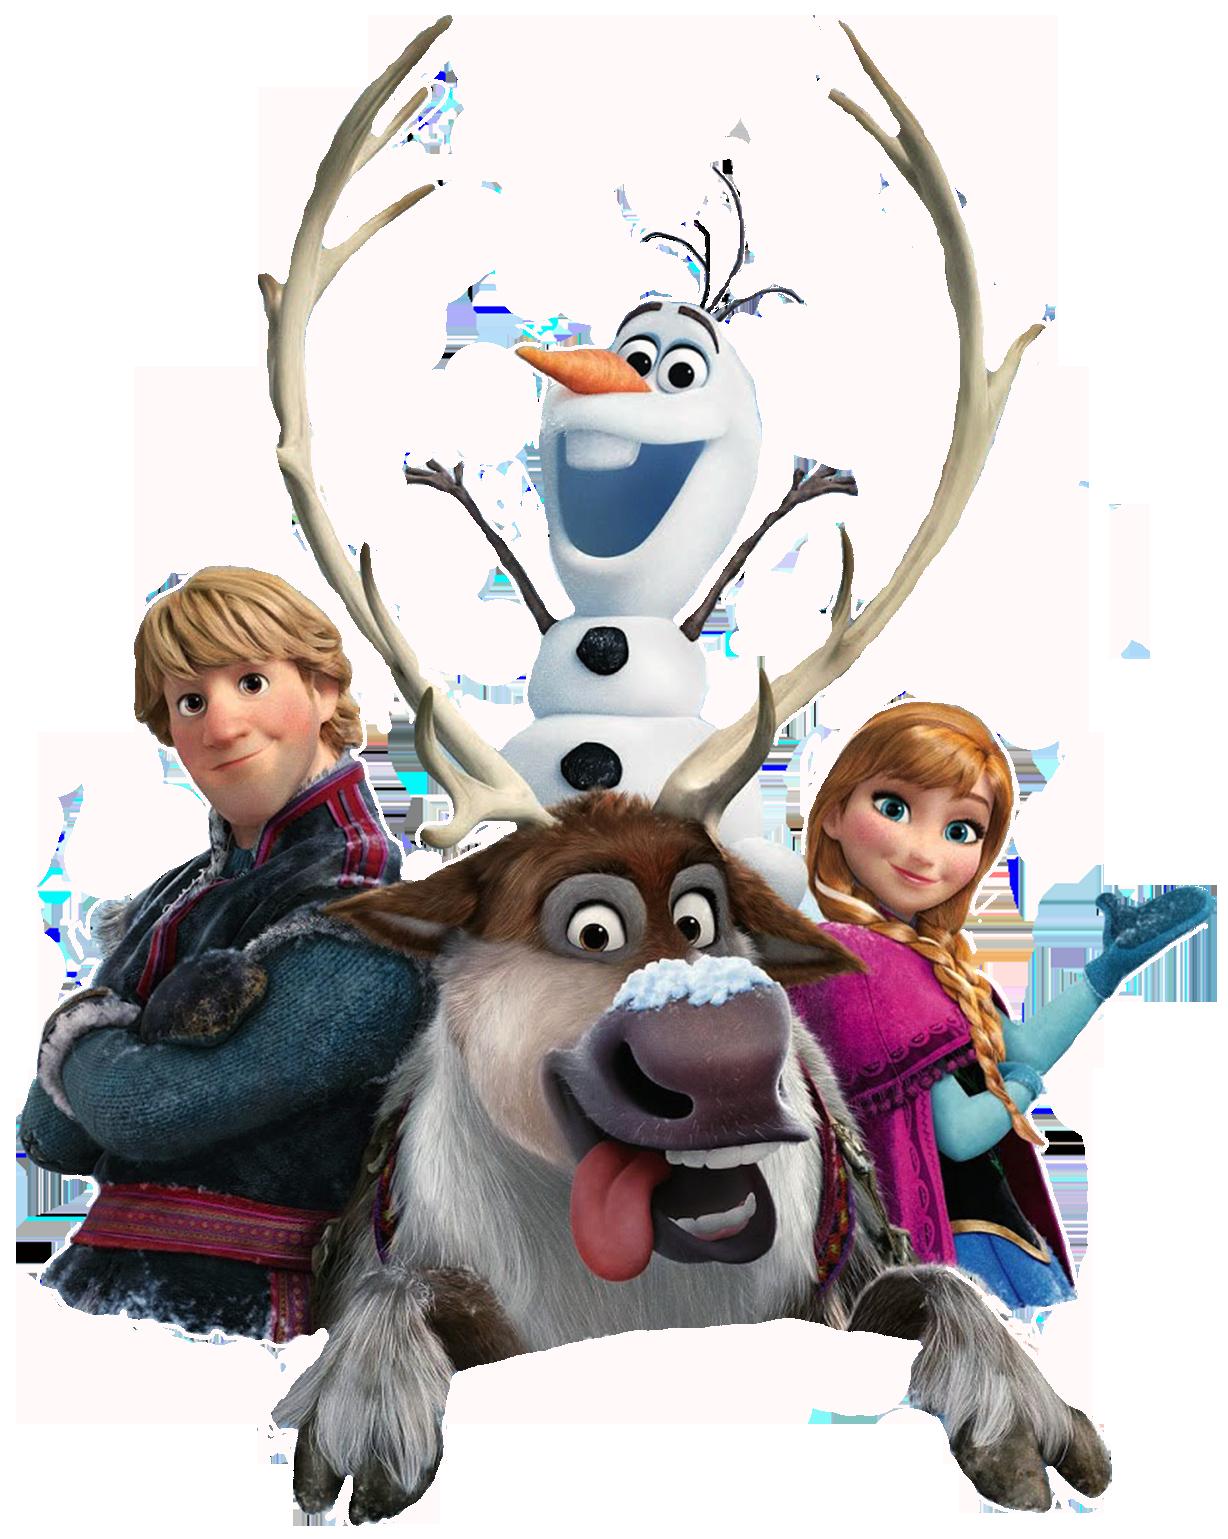 De frozen pinterest fiesta. Olaf clipart get well soon